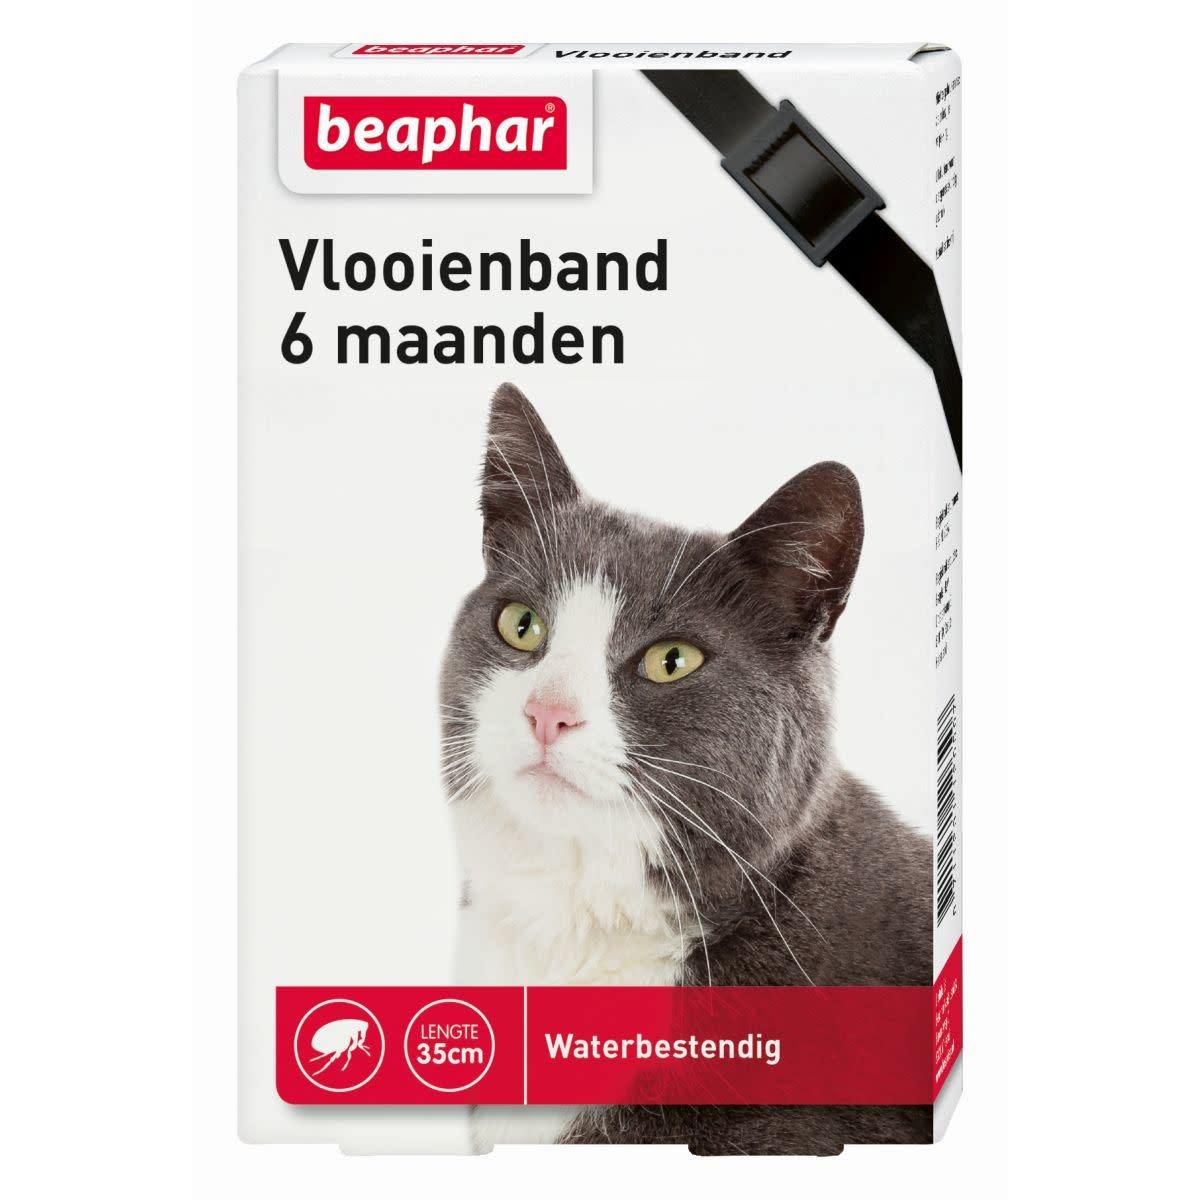 Beaphar Beaphar vlooienband kat